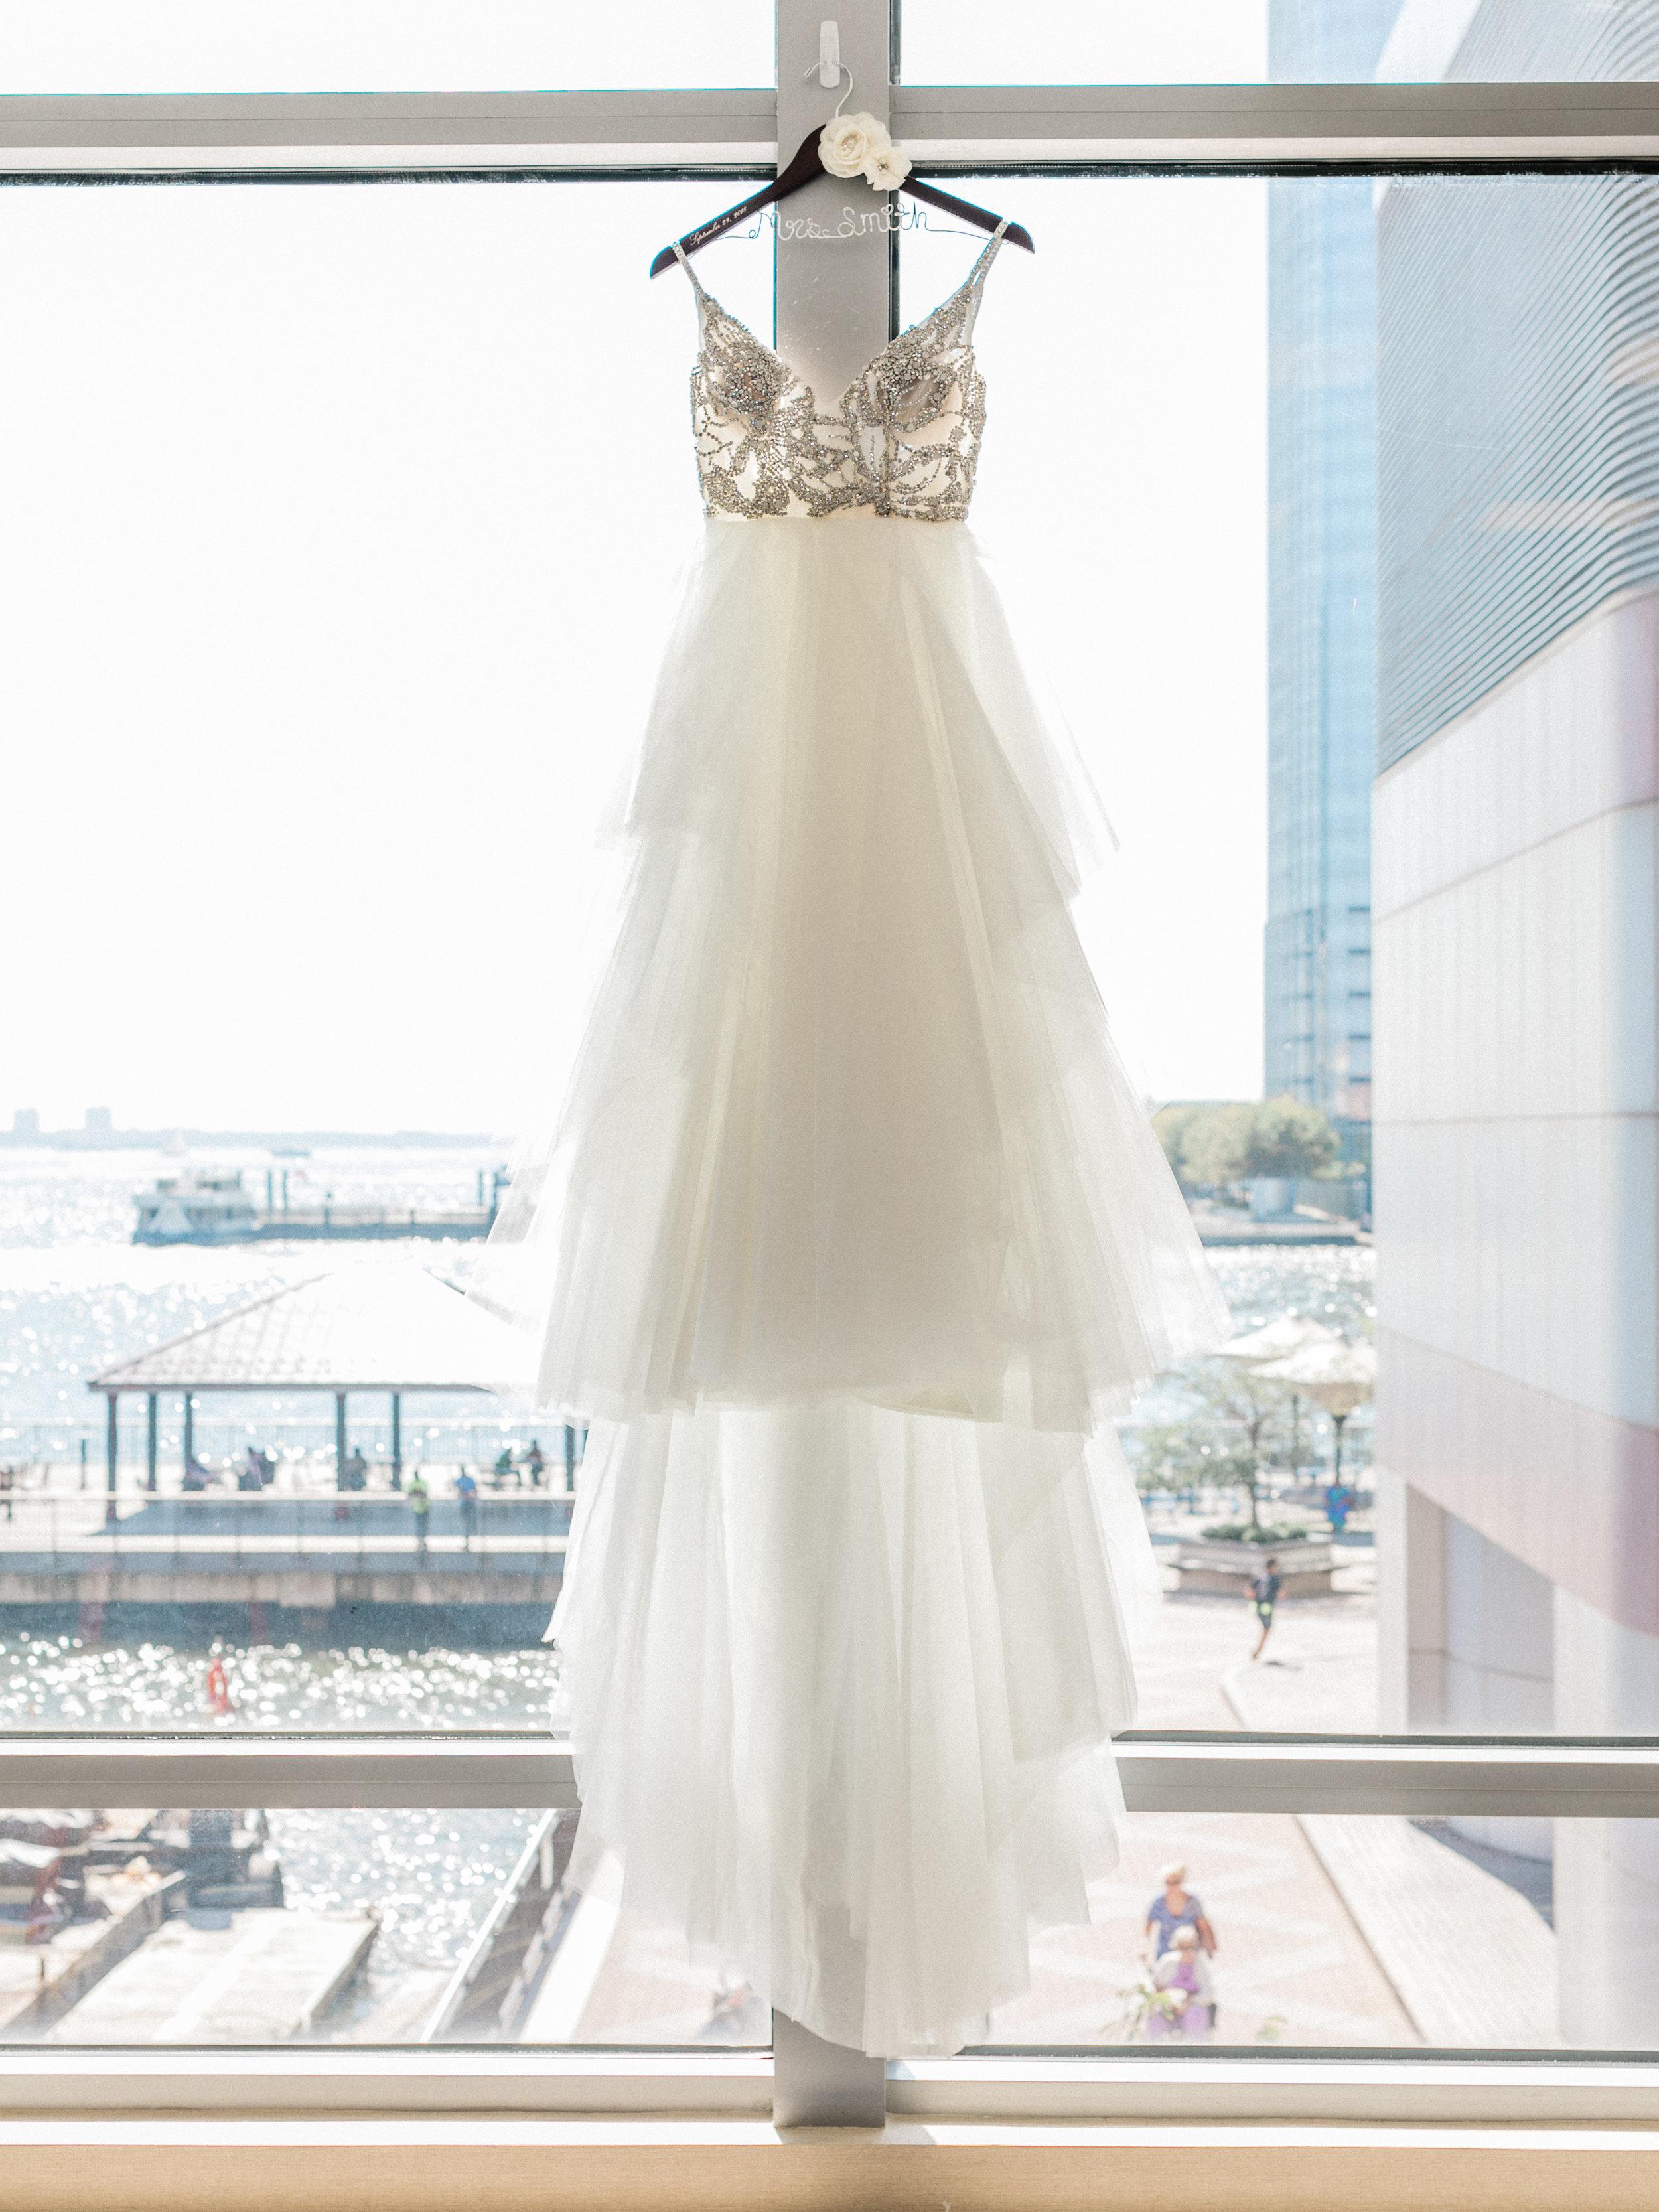 hyatt-regency-jersey-city-wedding-photographer9.jpg